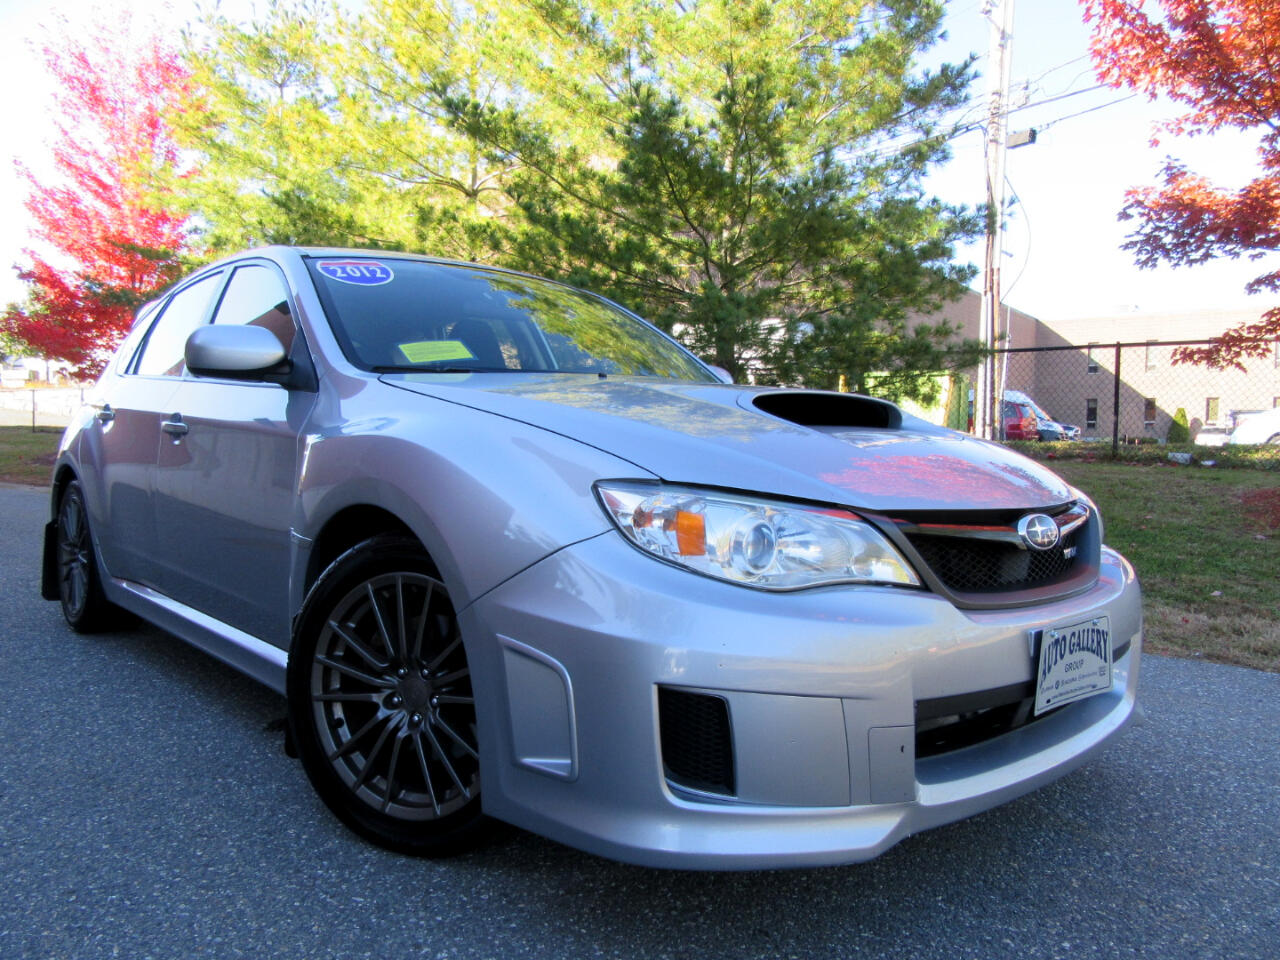 2012 Subaru Impreza Wagon WRX 5dr Man WRX